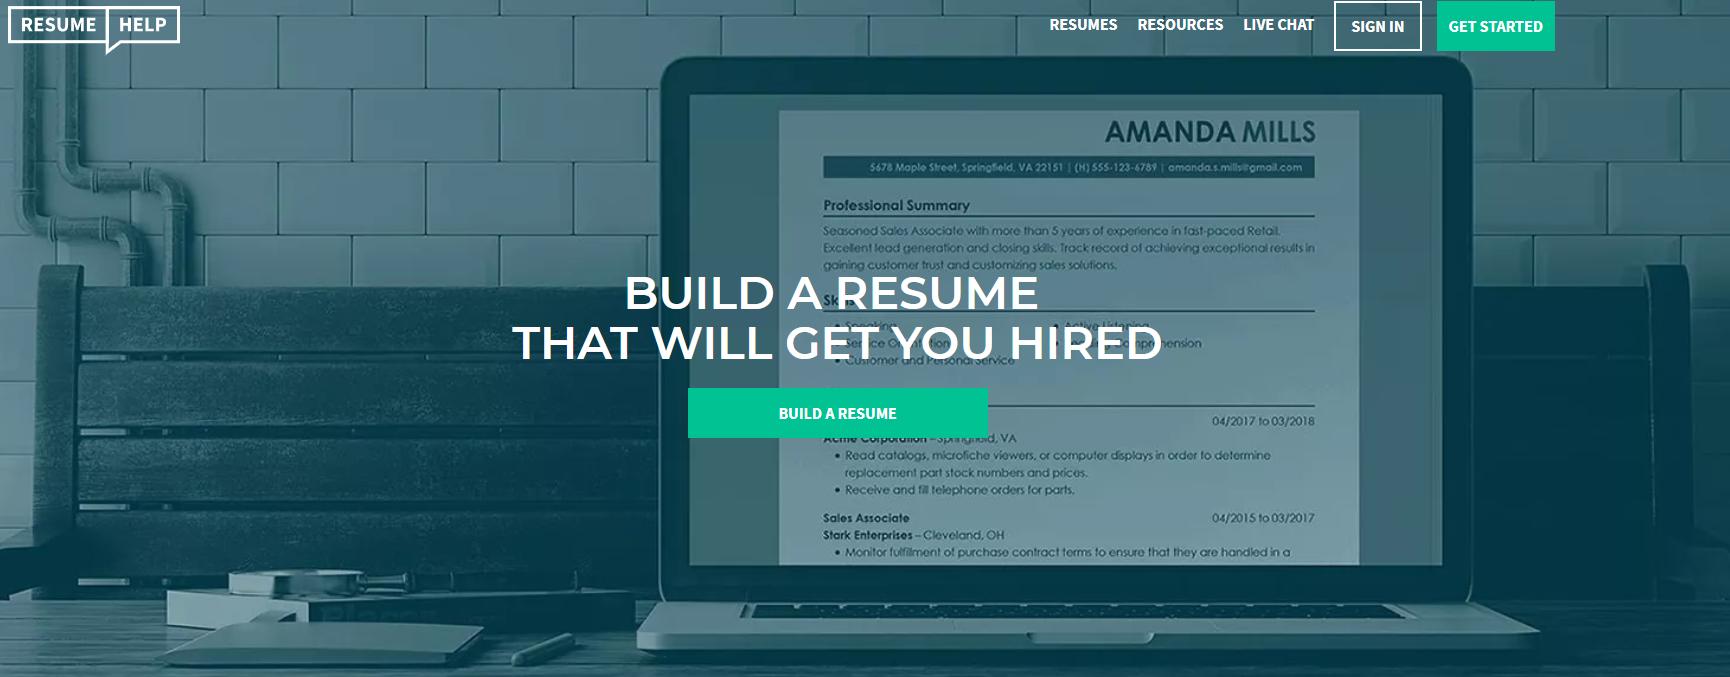 resumehelp.com Review by TopResumeWritingServices